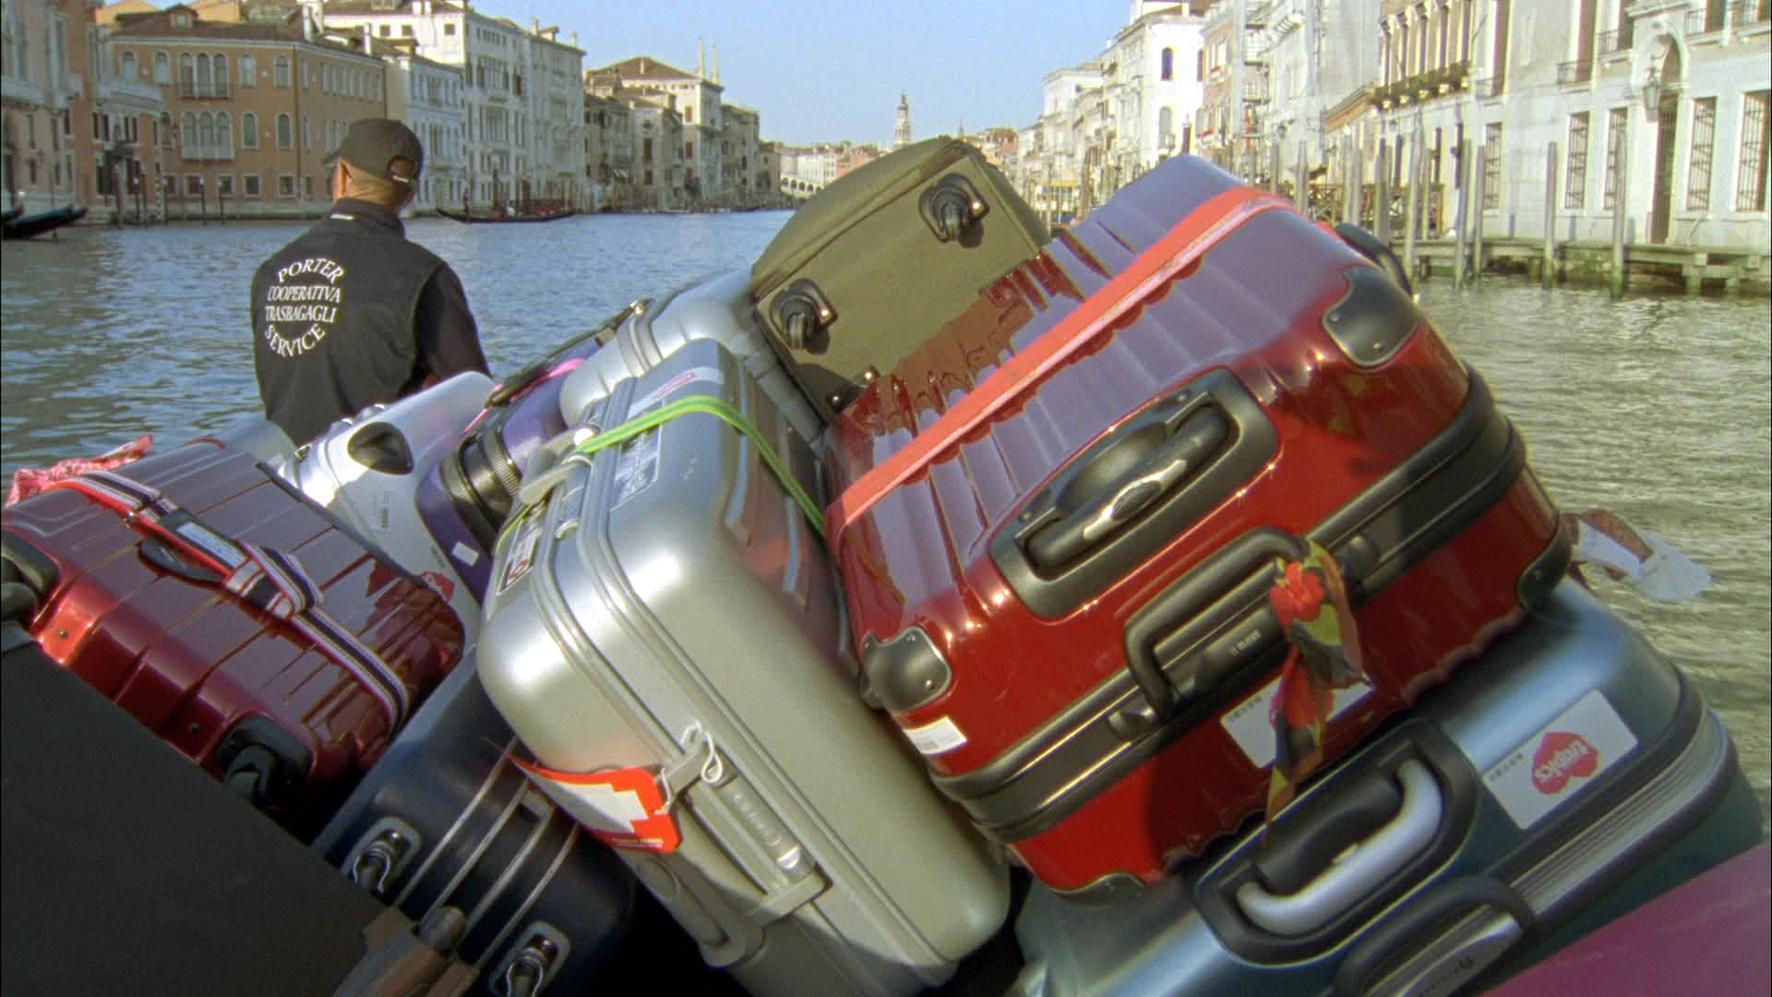 Is Venice a Dream?